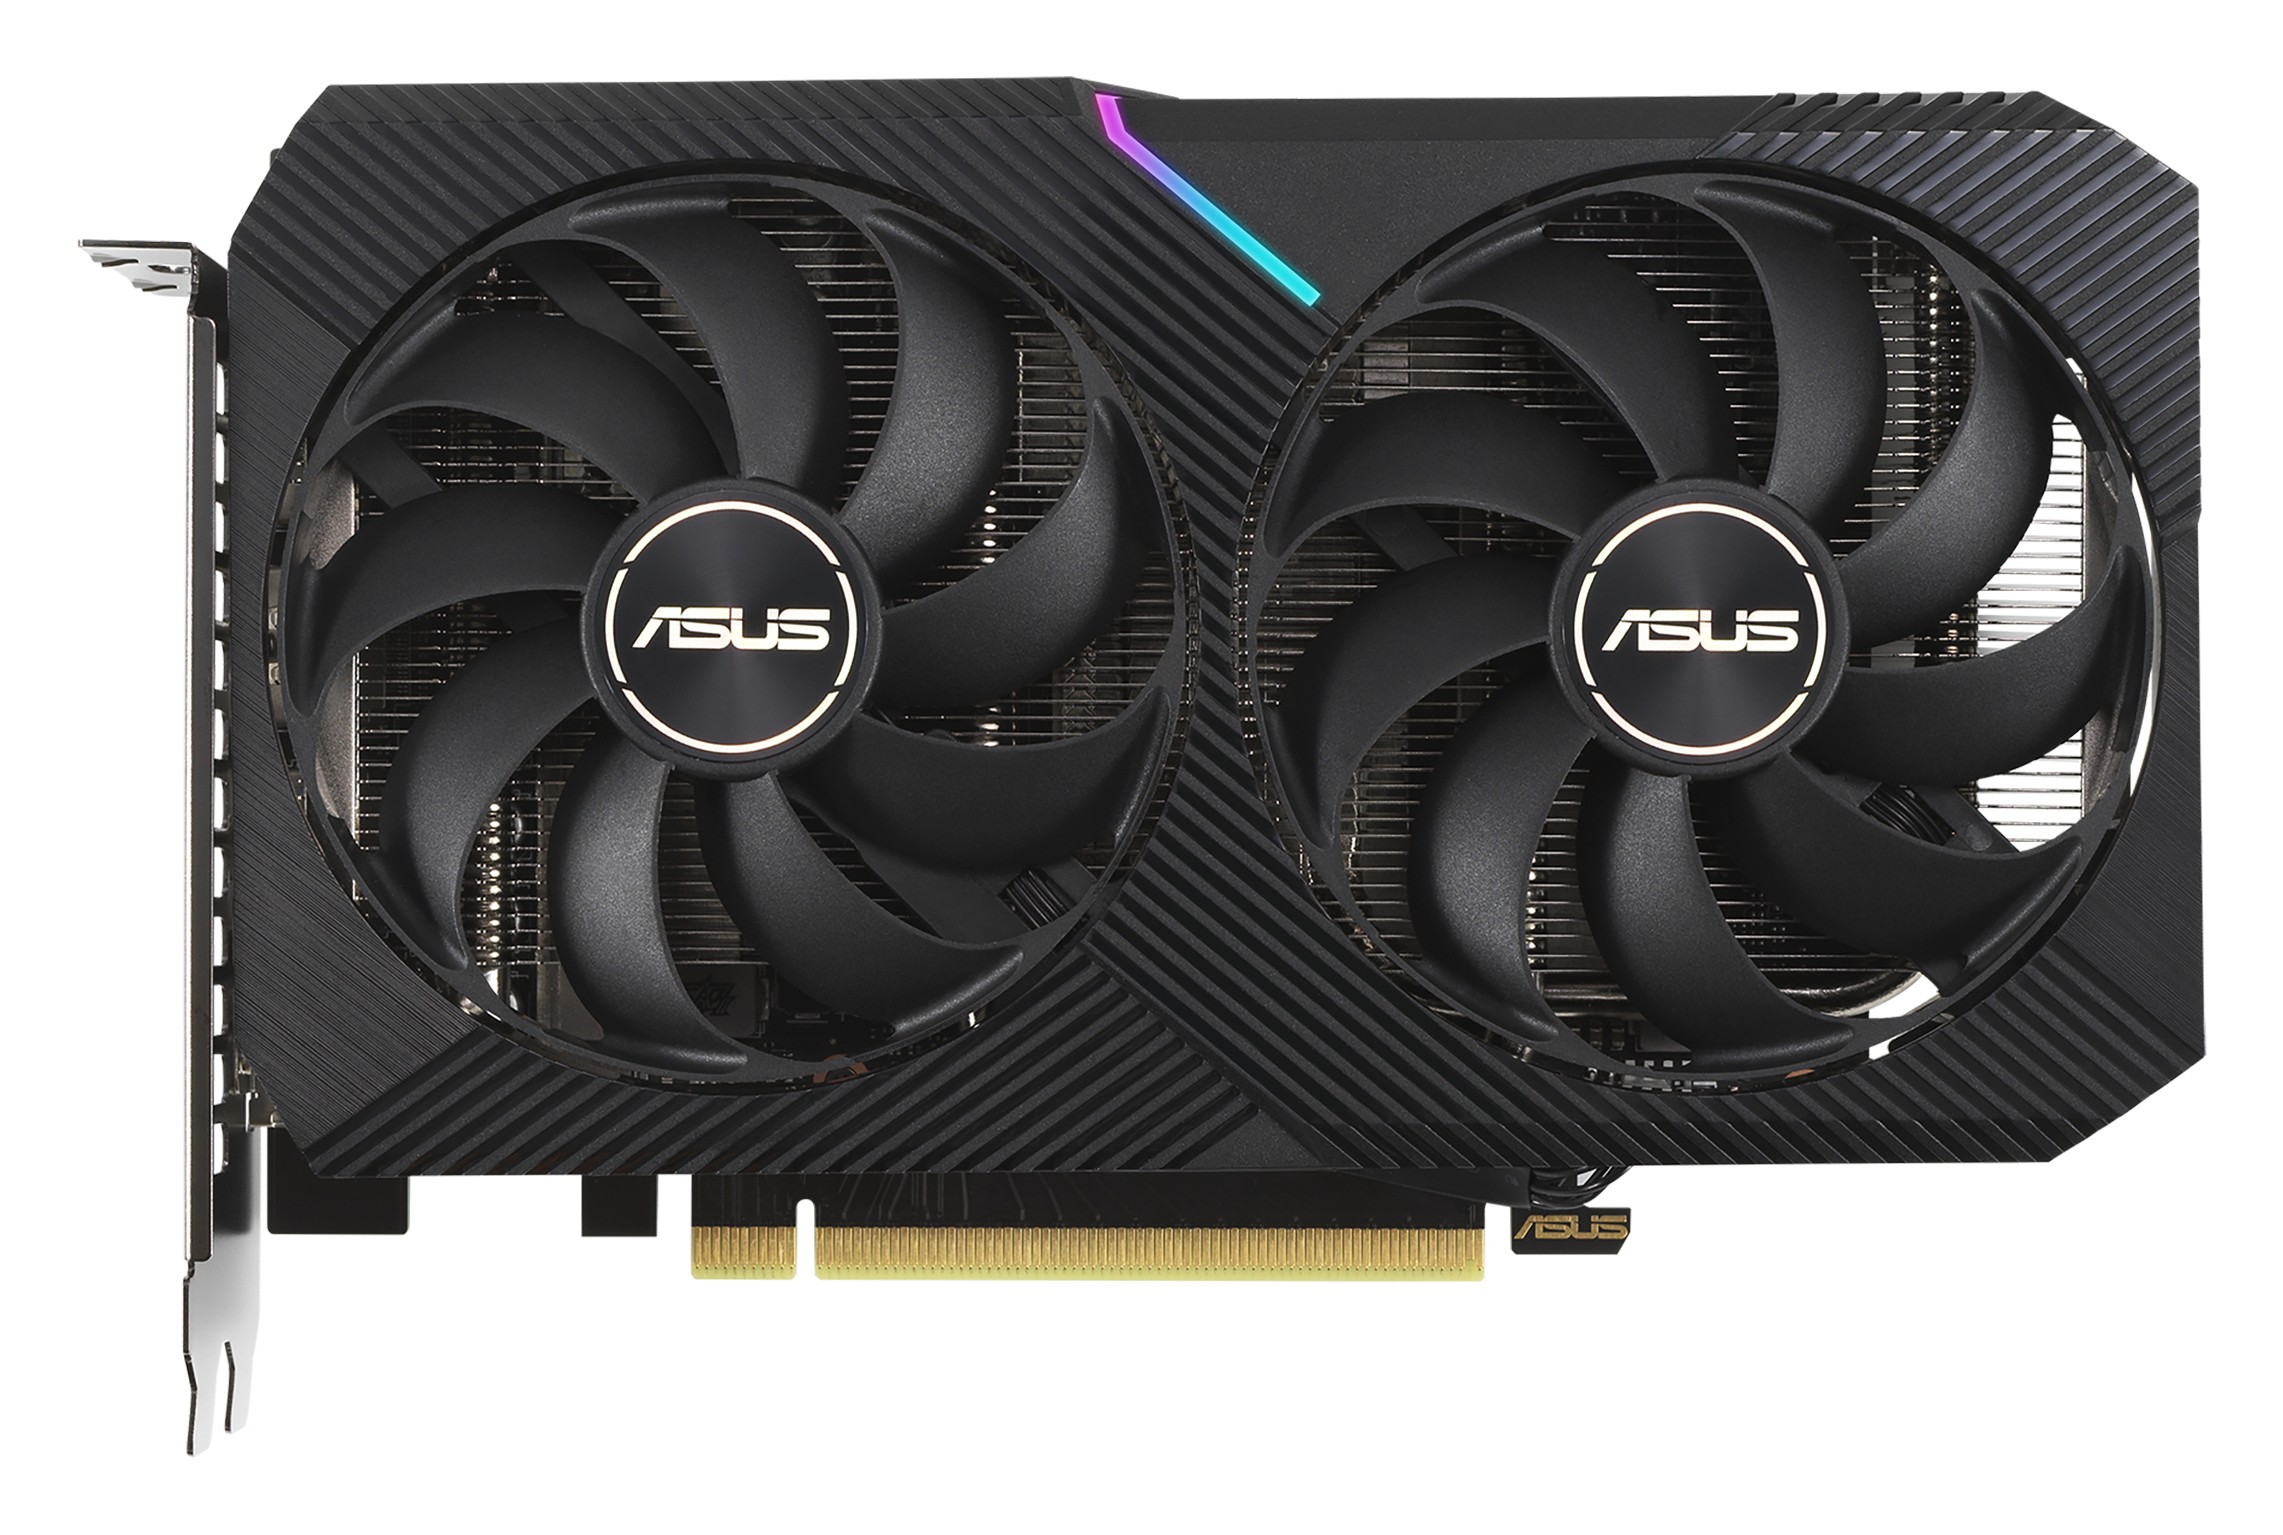 ASUS Dual -RTX3060-12G NVIDIA GeForce RTX 3060 12 GB GDDR6